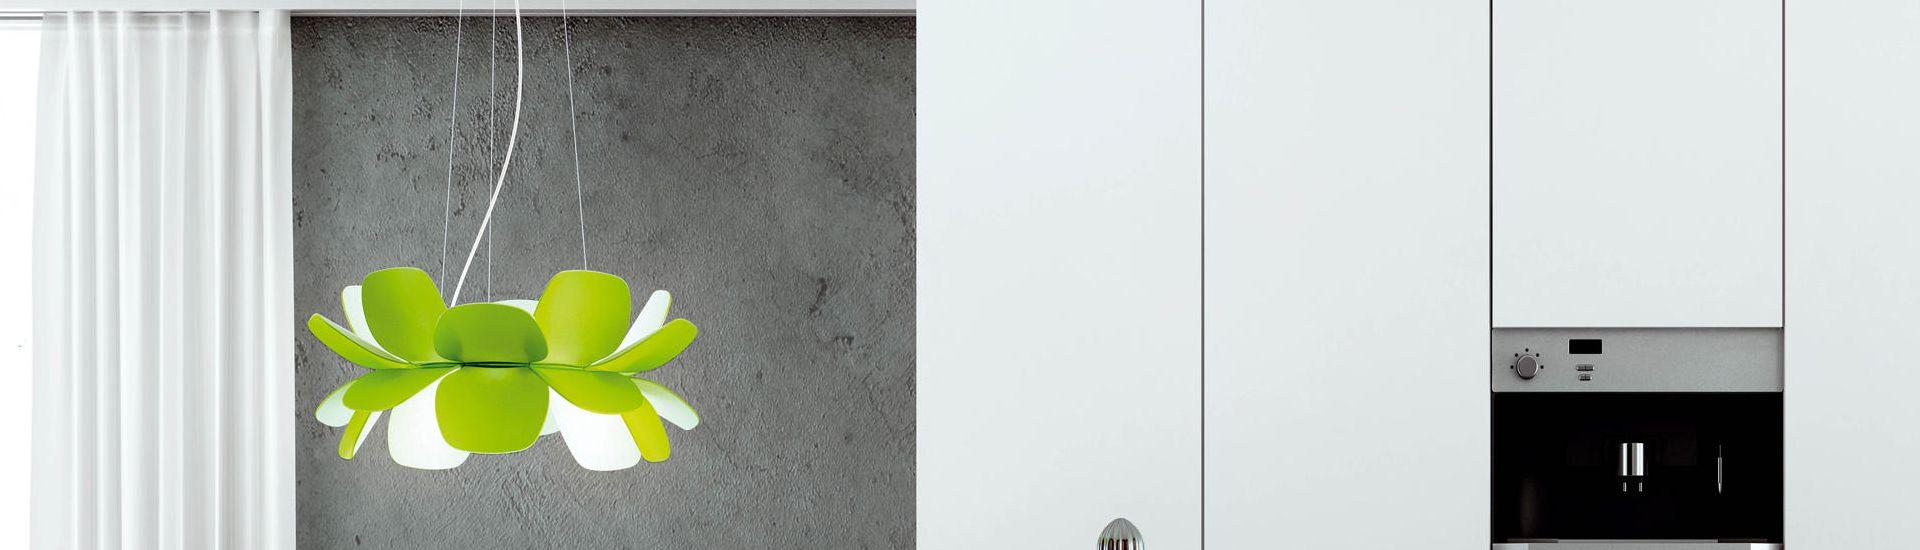 Infiore T 5805 Pendant Lamp ECO 120W Green